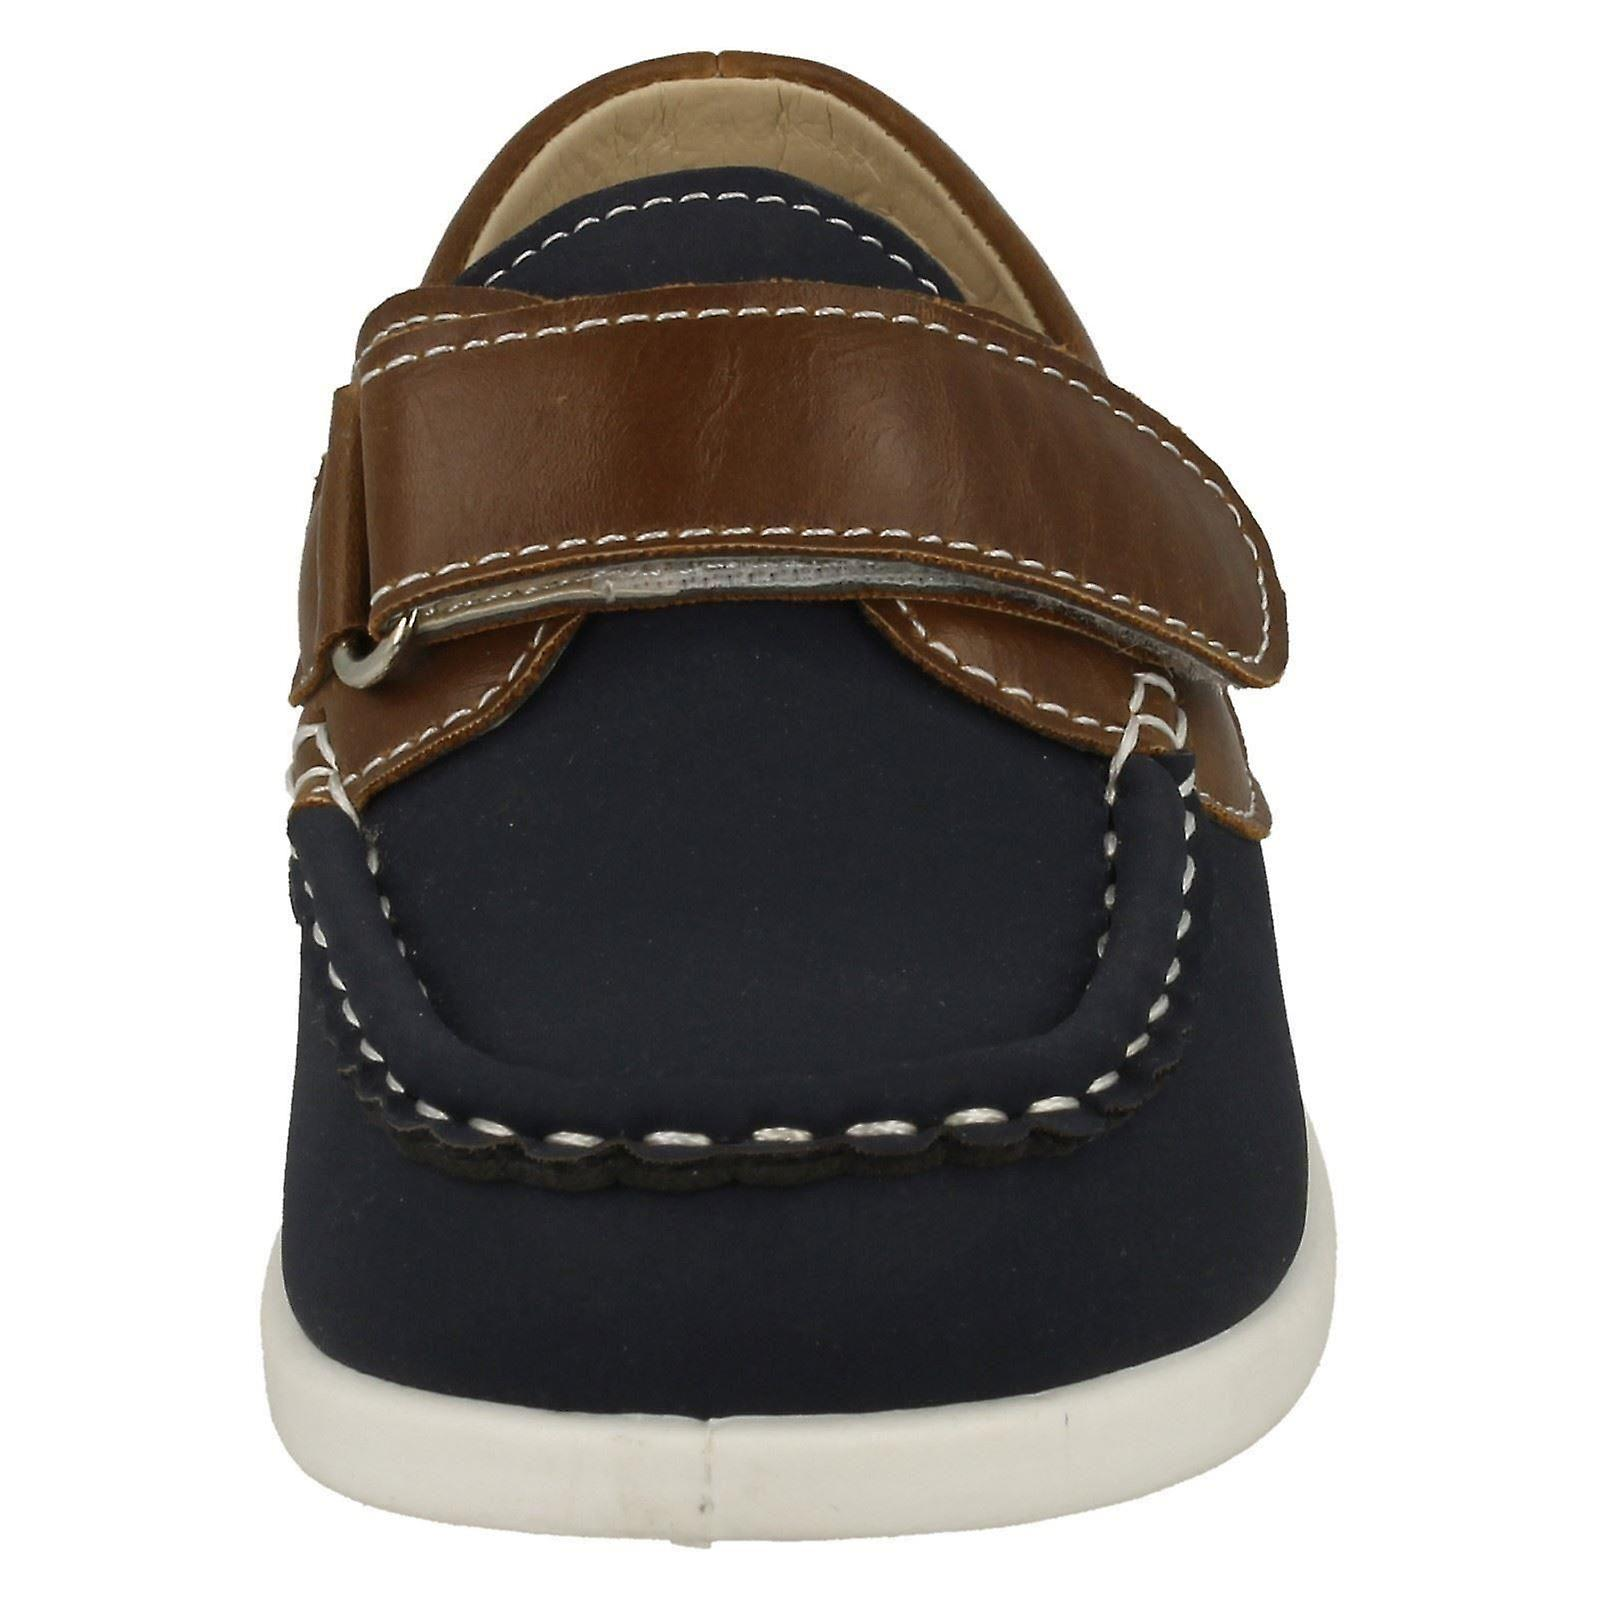 Boys JCDees Loafer Loafer Loafer Style Shoes n1108 c7df5d